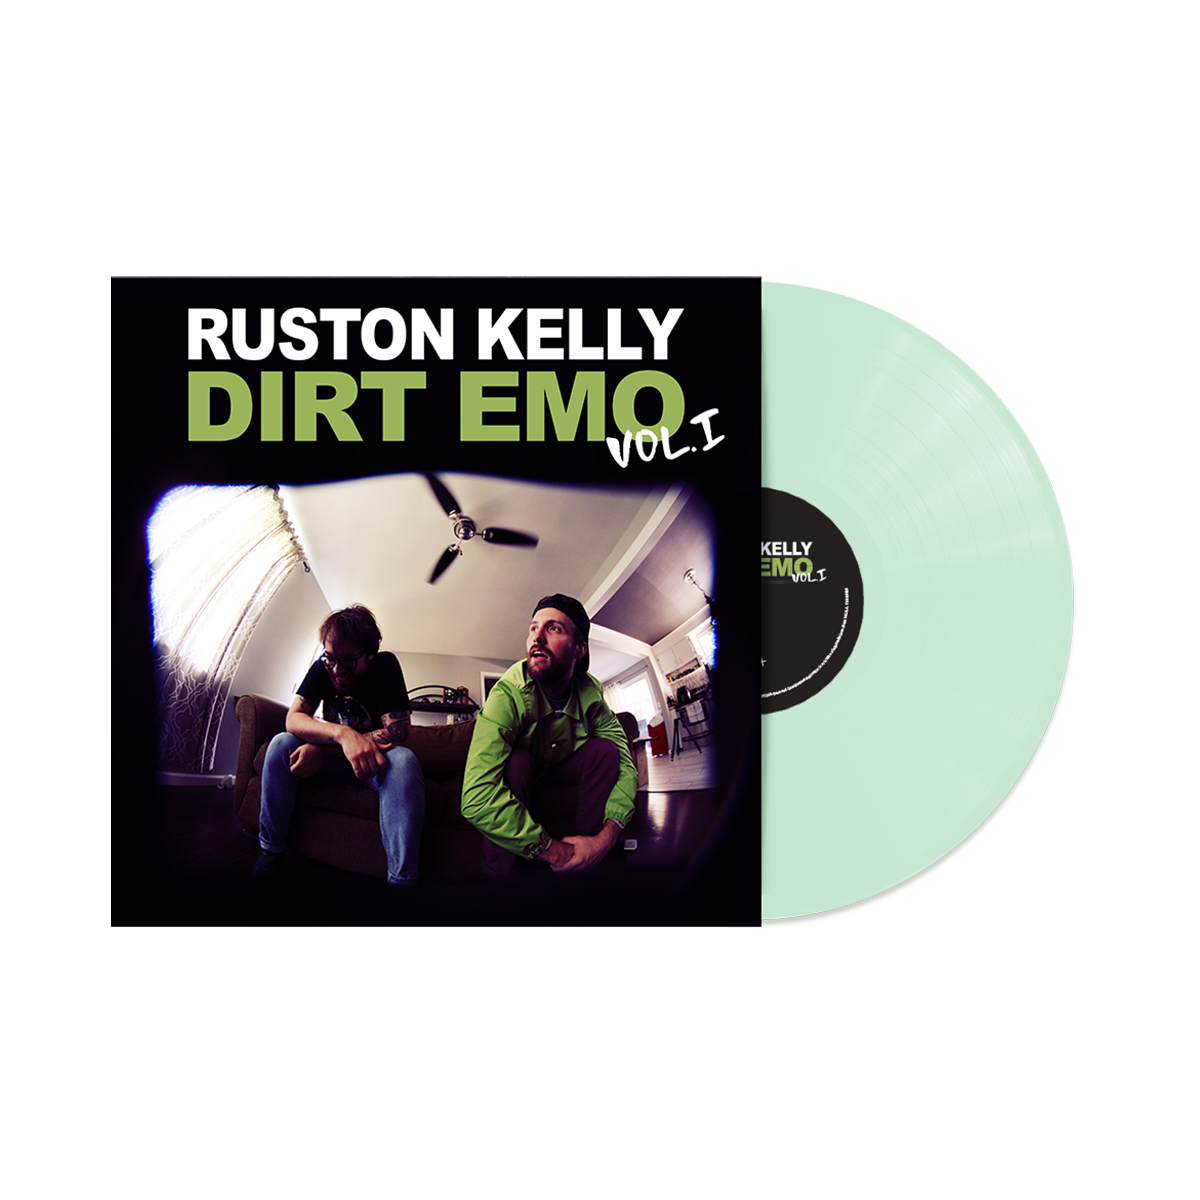 Signed Dirt Emo Vol. 1 Test Pressing + Glow-in-the-dark Dirt Emo Vol. 1 Vinyl Bundle